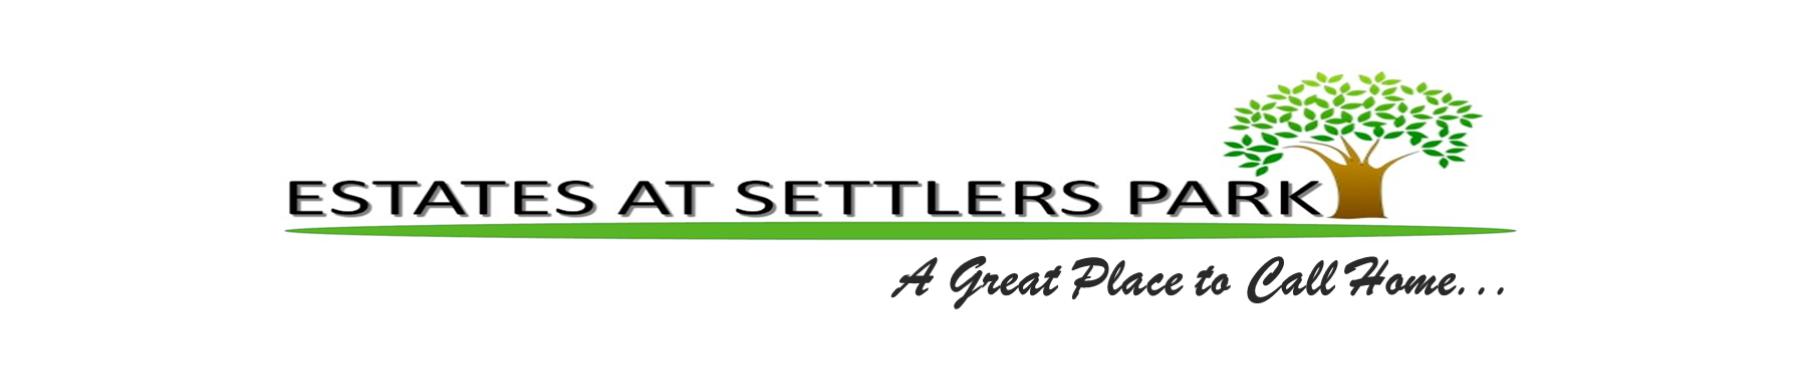 Estates at Settlers Park OA cover